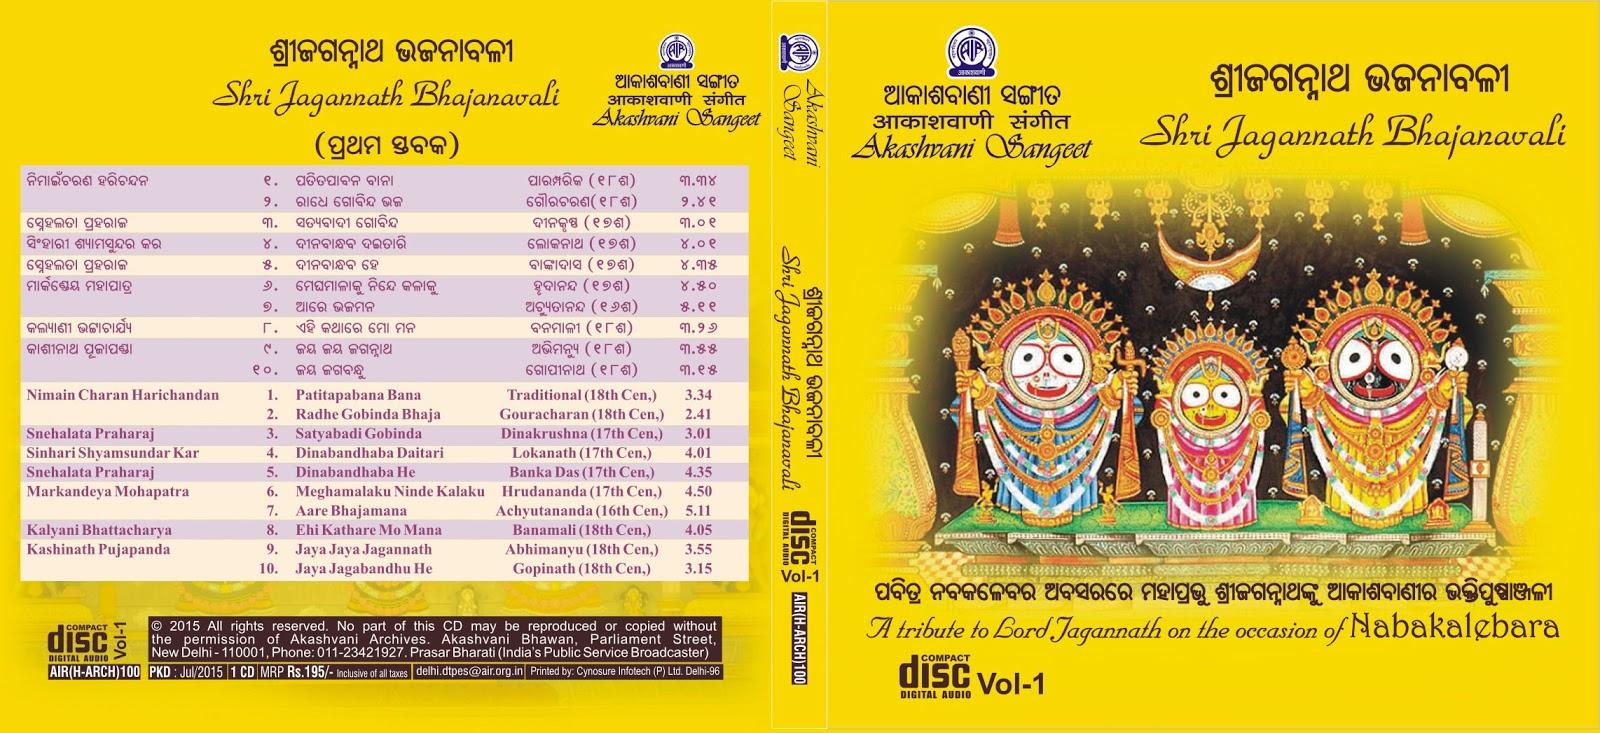 akashvani jagannath rath yatra bhubaneswar buzz 1